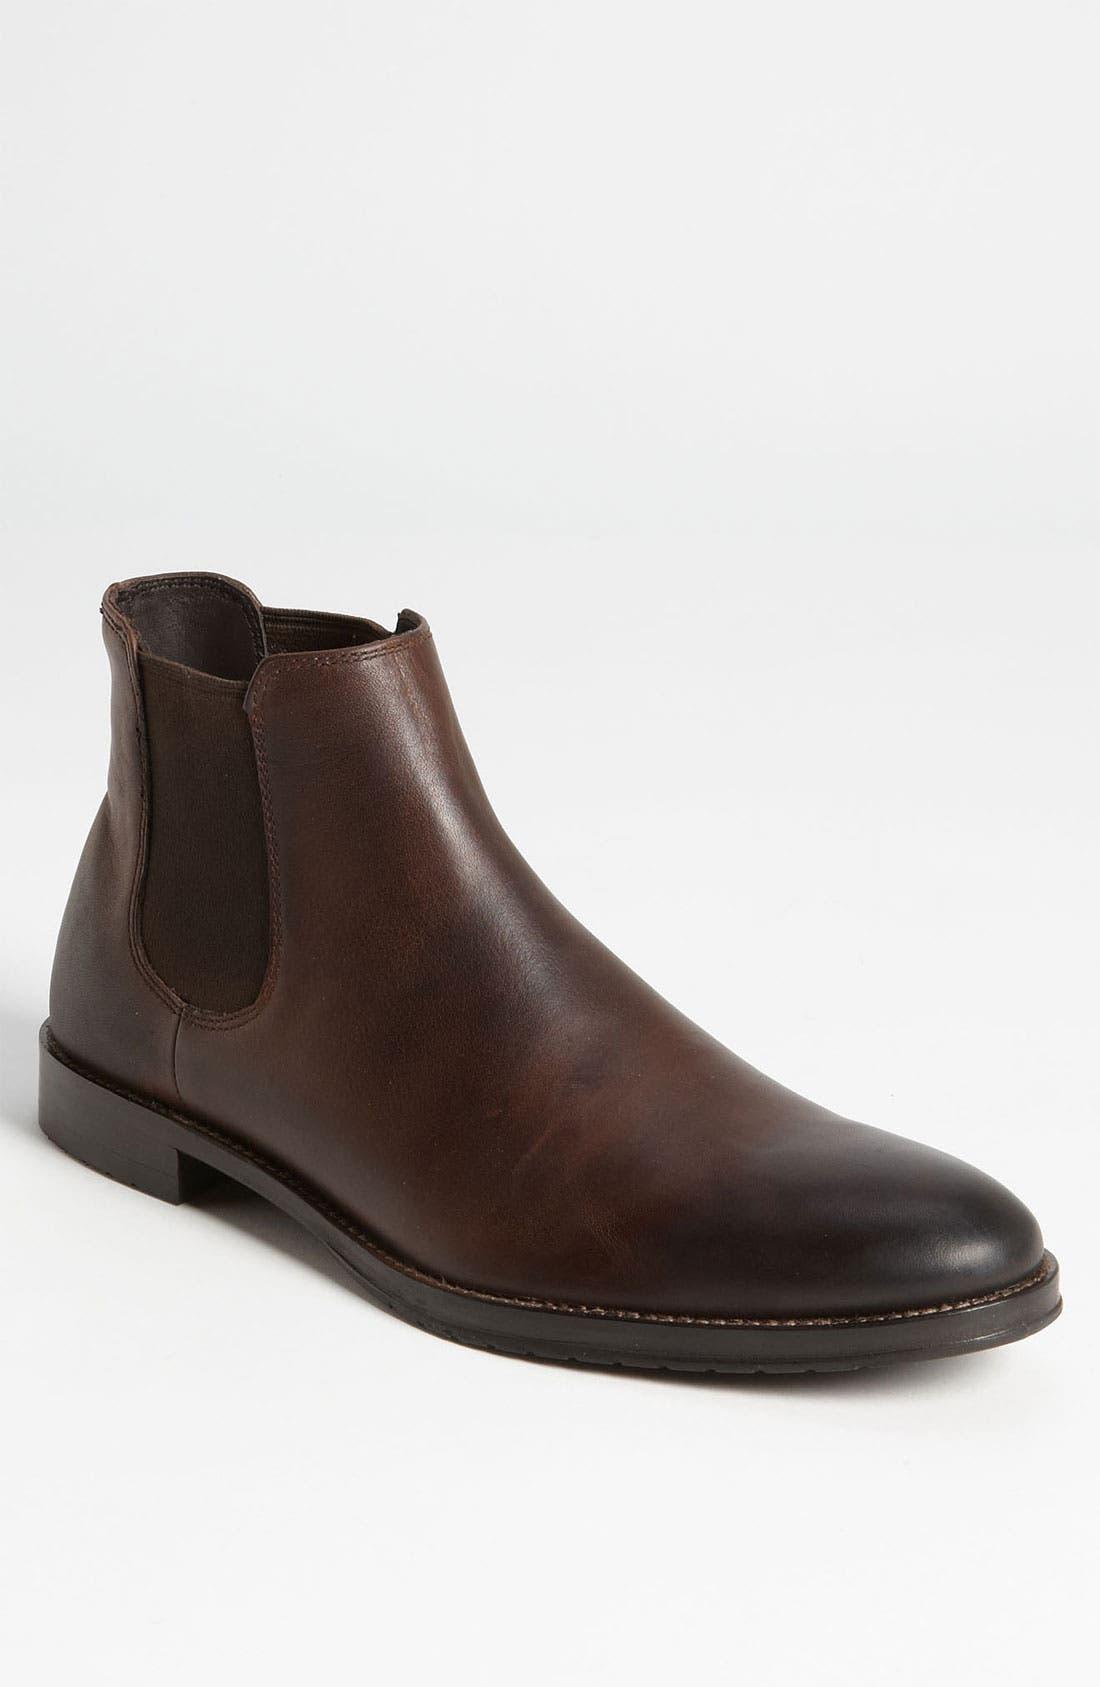 Alternate Image 1 Selected - Gordon Rush 'Ontario' Chelsea Boot